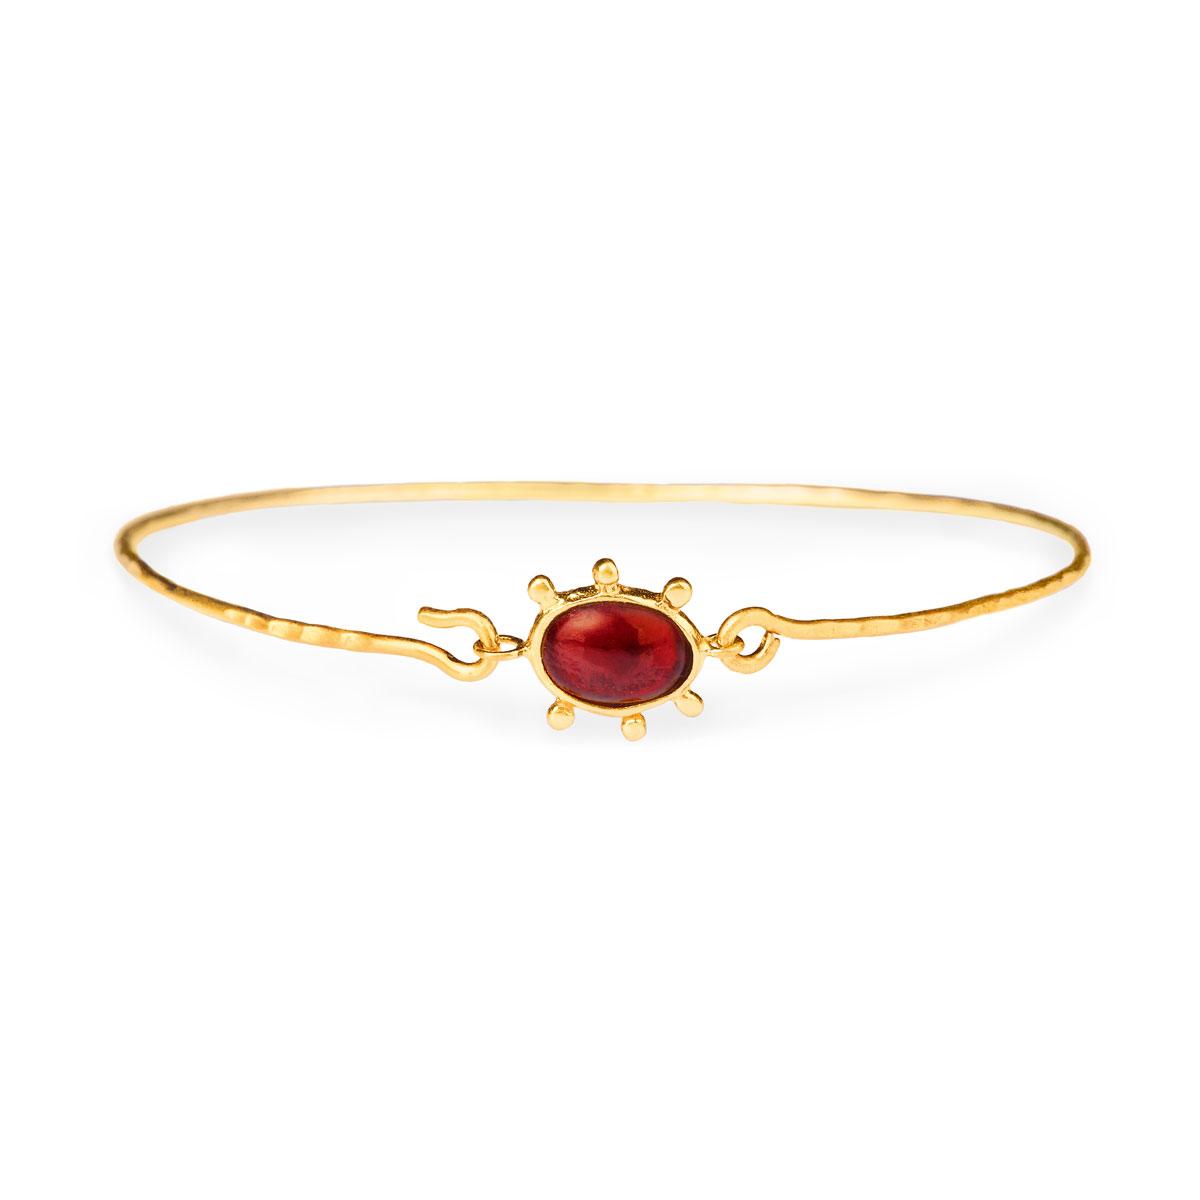 garnet-bracelet-danai-gianelli_high